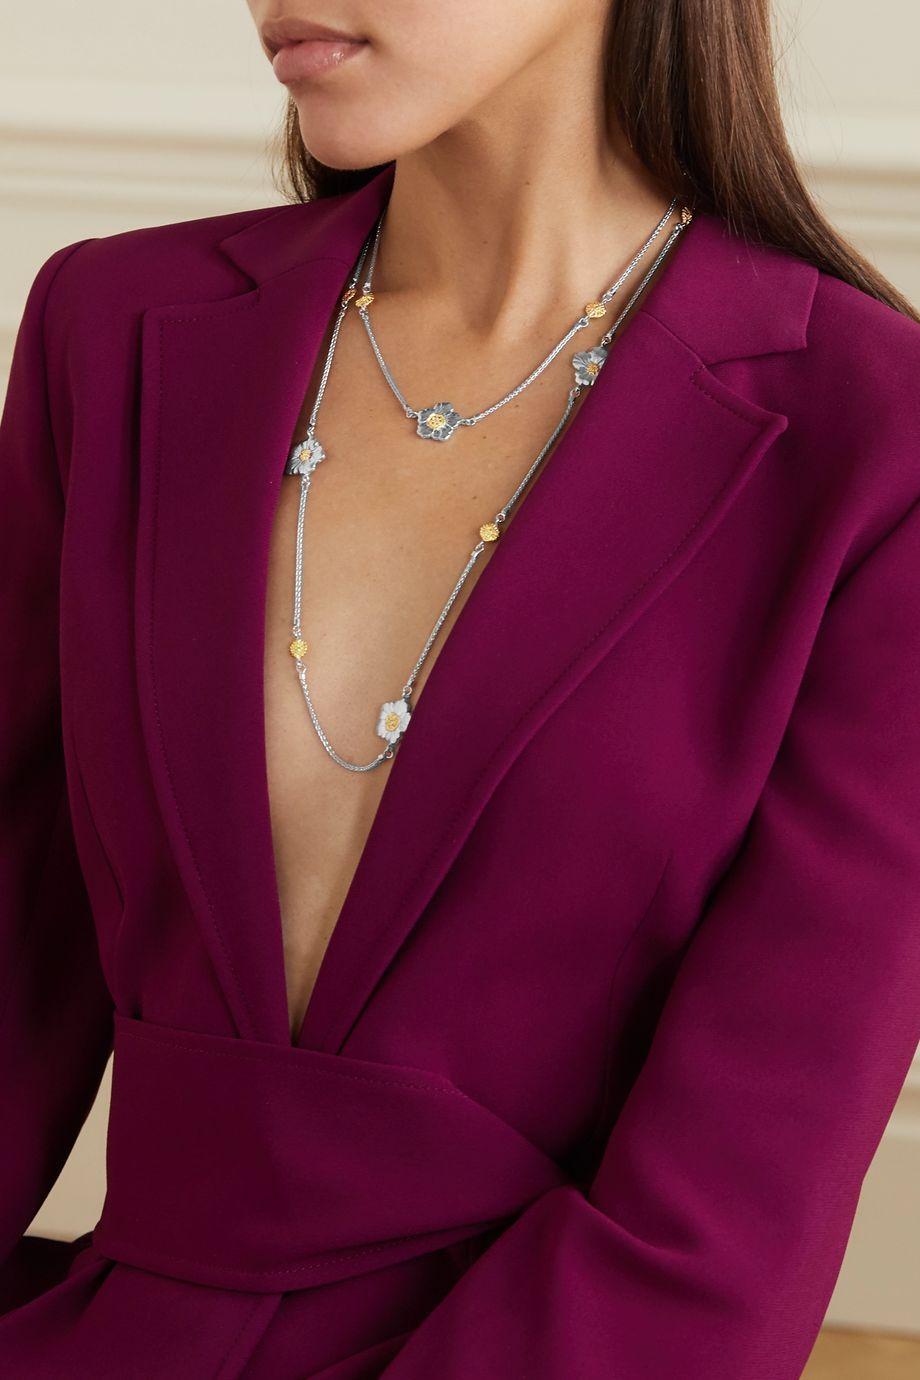 Buccellati Gardenia sterling silver and gold vermeil diamond necklace